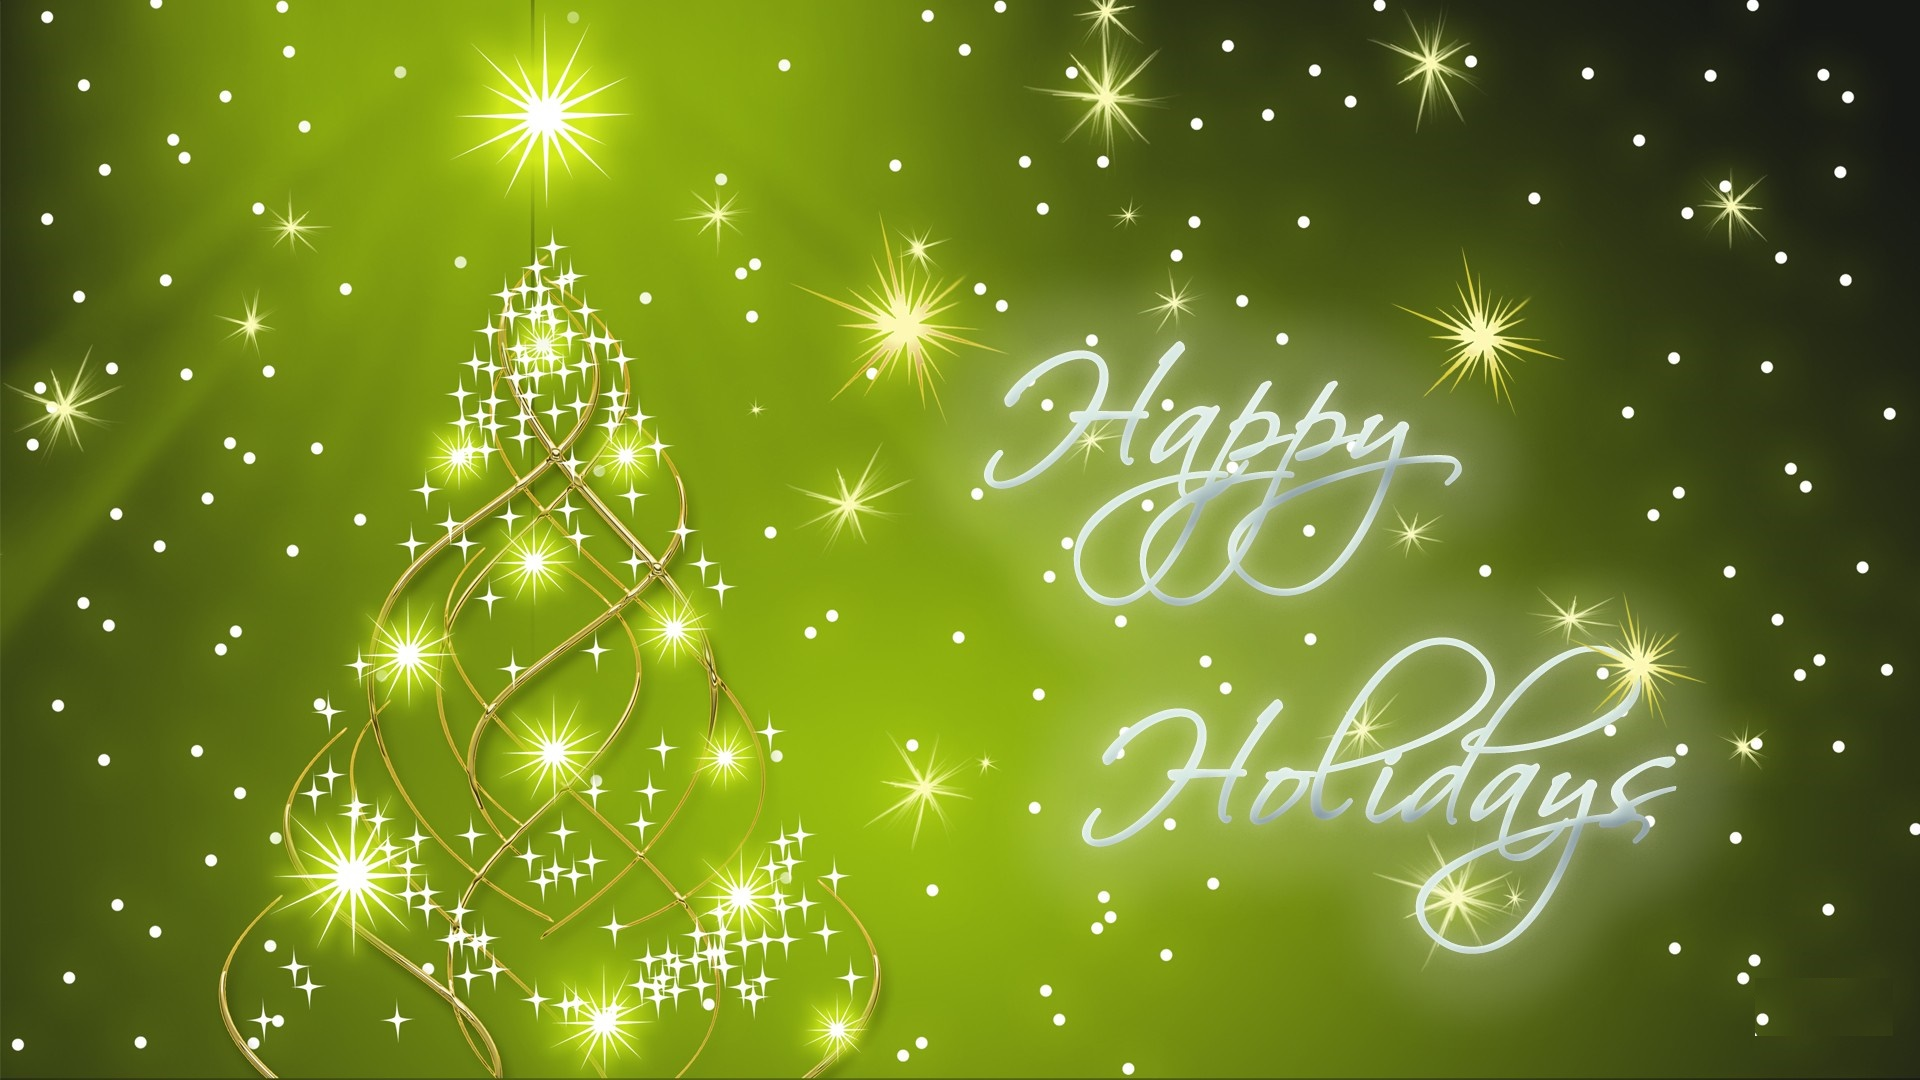 Happy Holidays Wallpapers 039 Mb WallpapersExpertcom 1920x1080